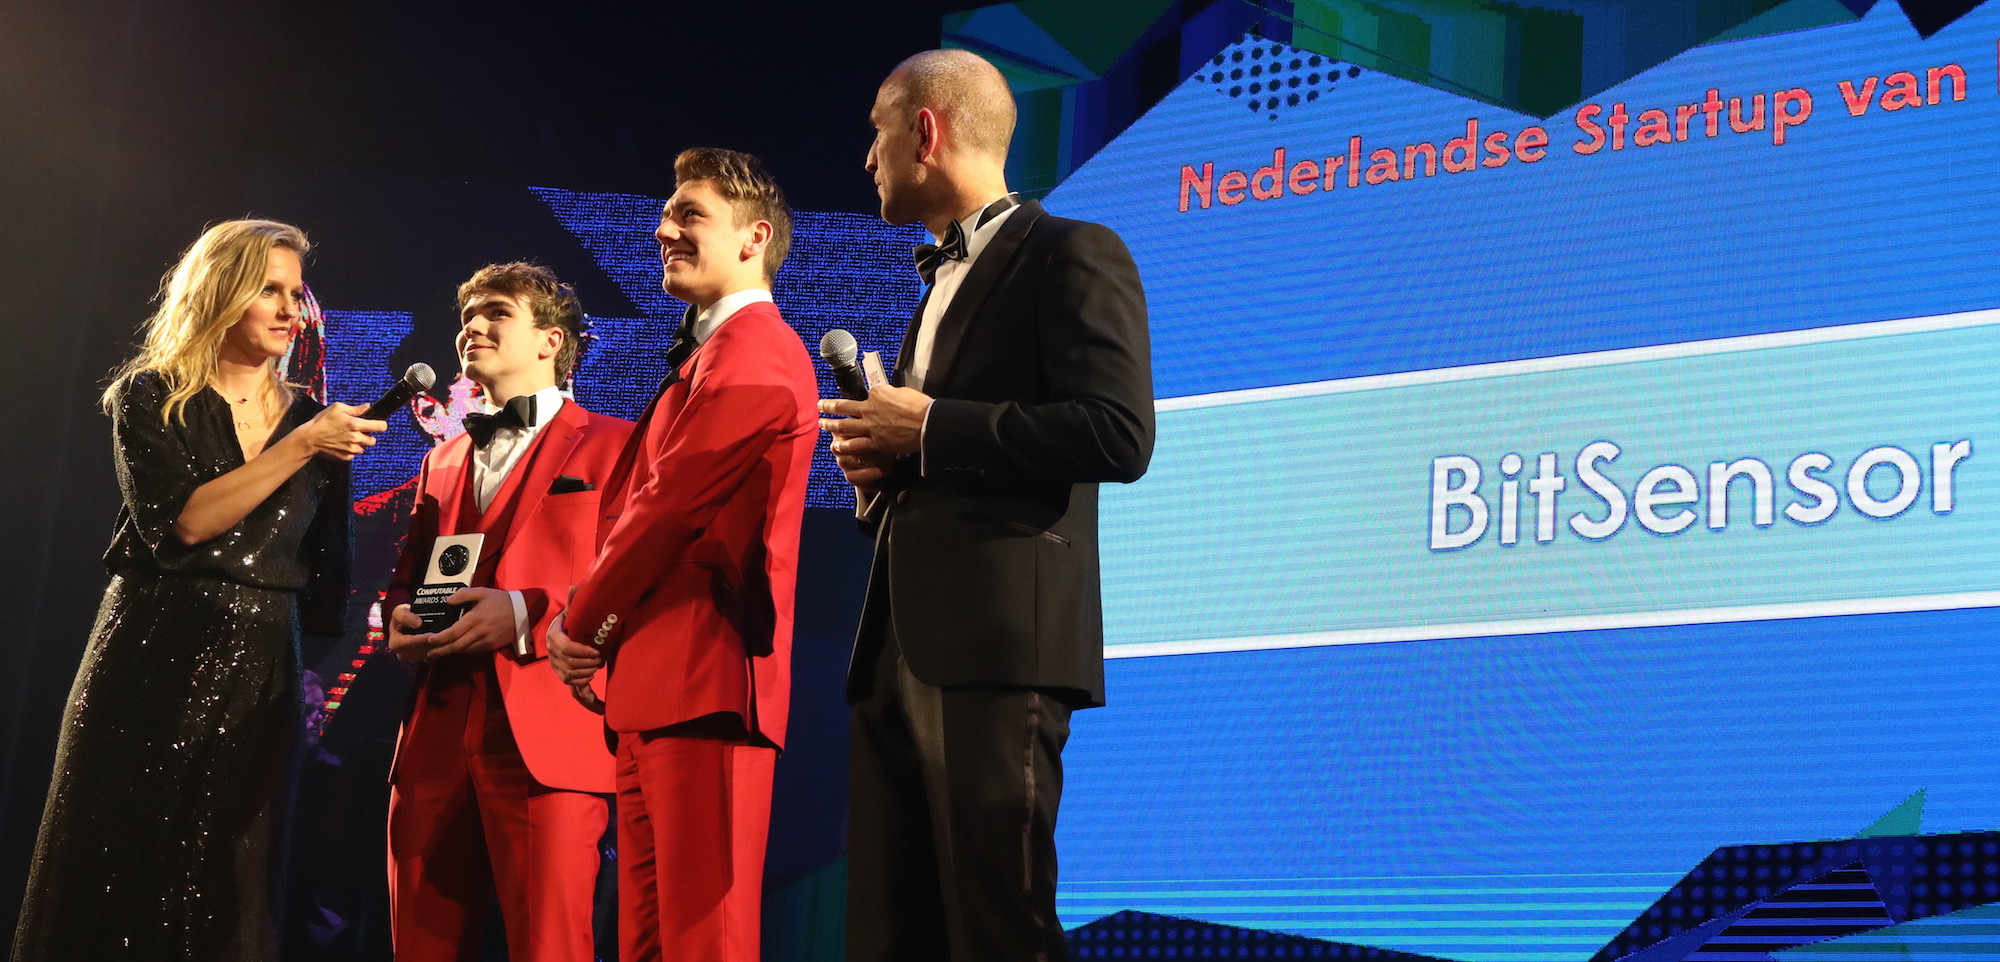 Bitsensor wins Computable Startup Award